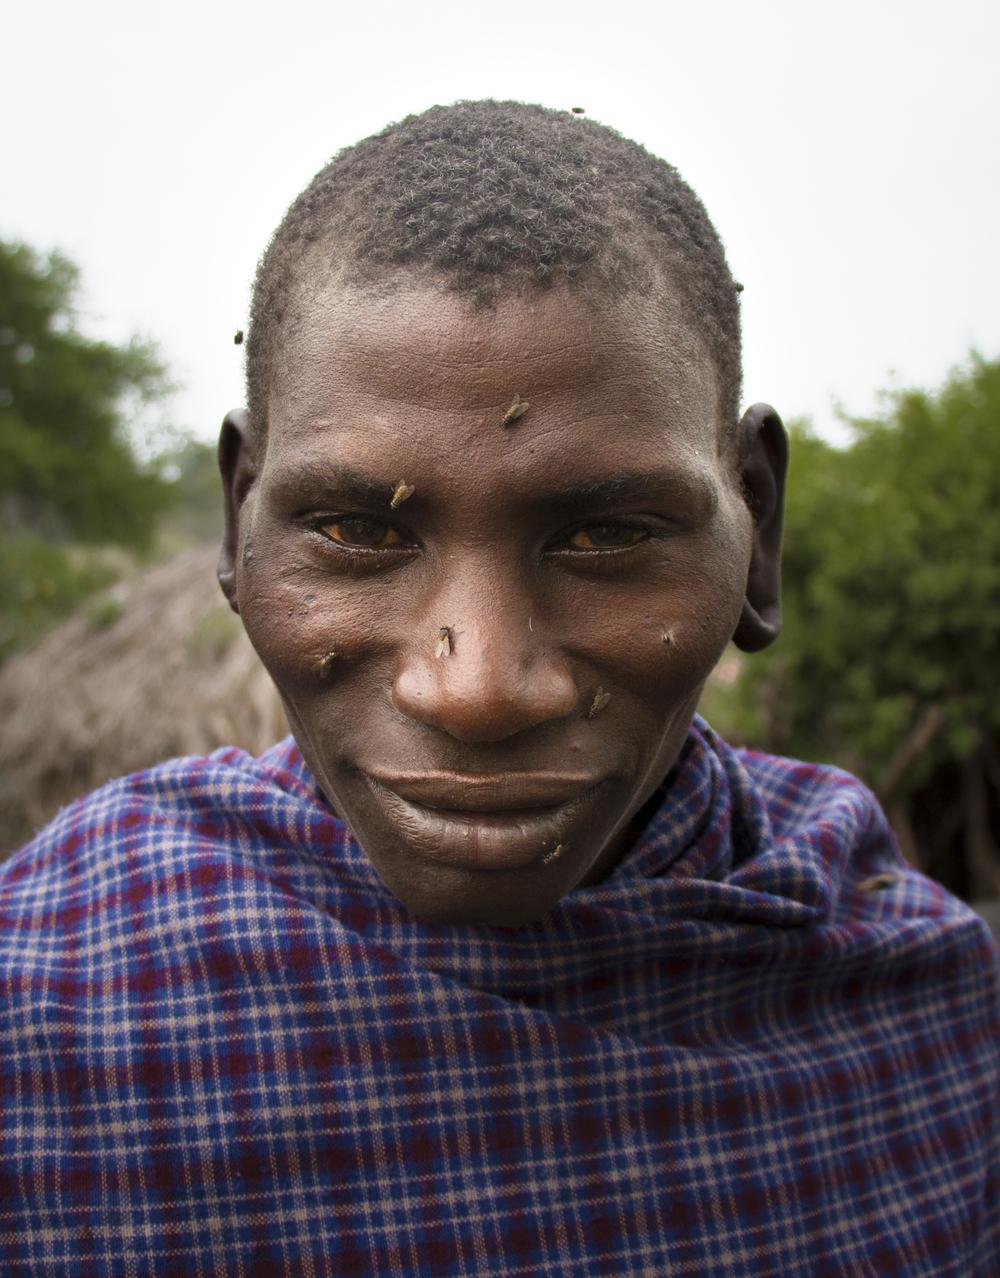 Maasai Portrait18Color.jpg